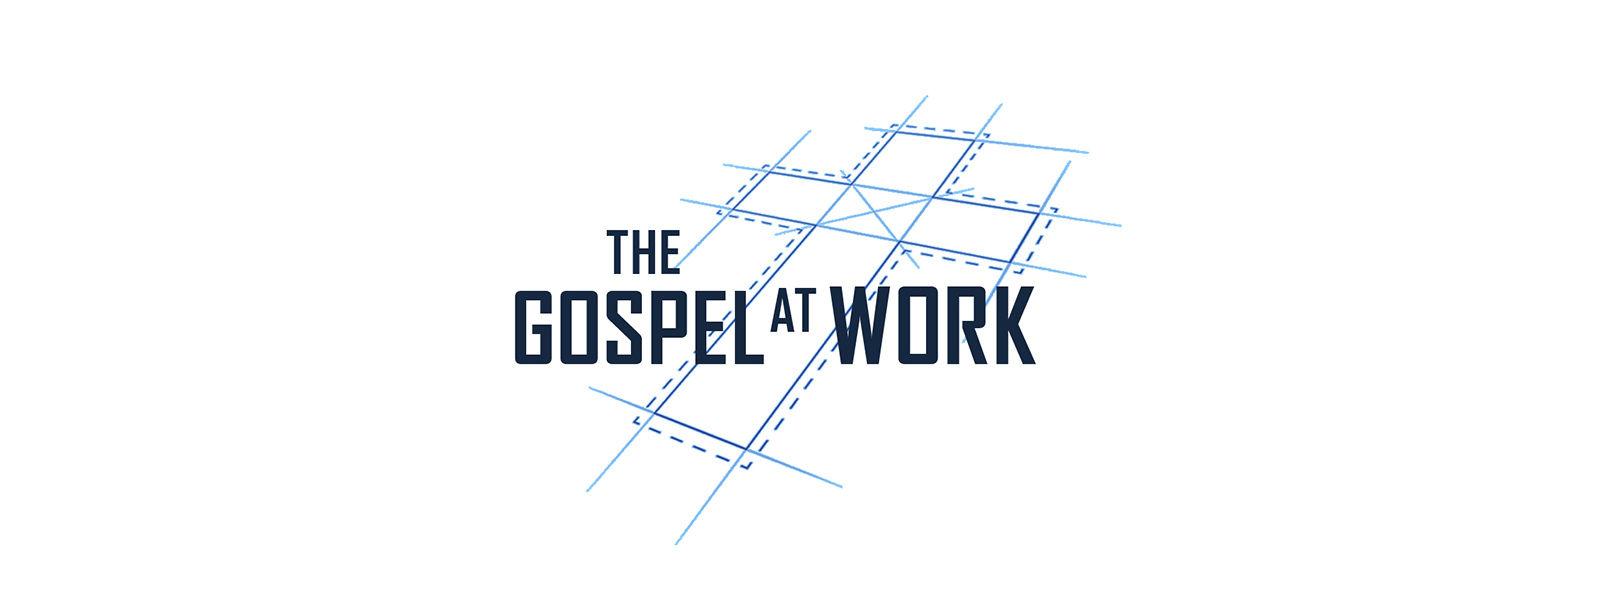 Rightnow media streaming video bible study the gospel at work sebastian traeger the gospel at work